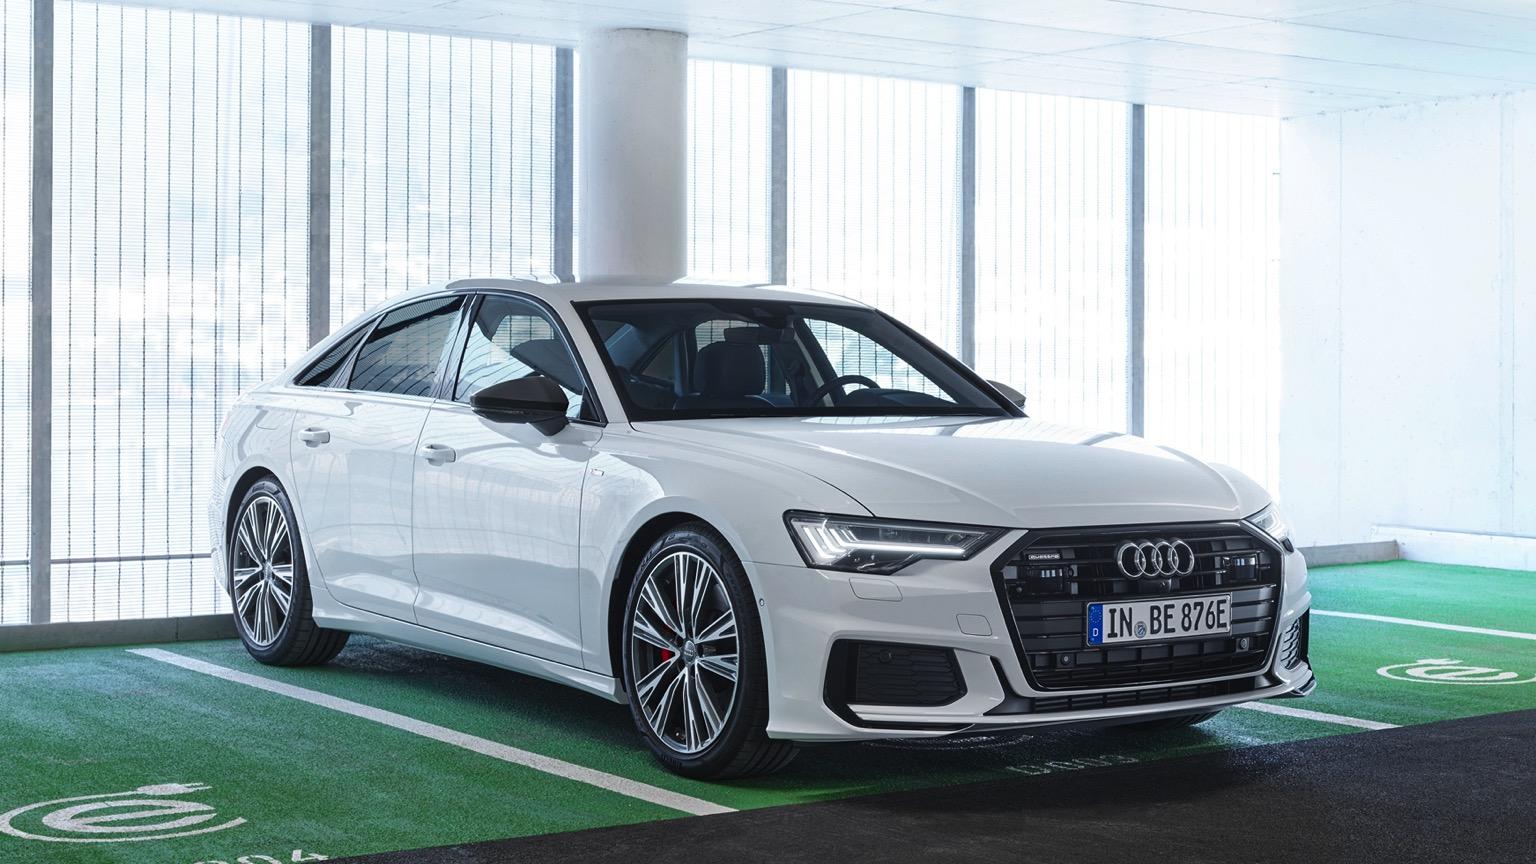 Audi A6 Sedan 50 TFSI e quattro (2021)